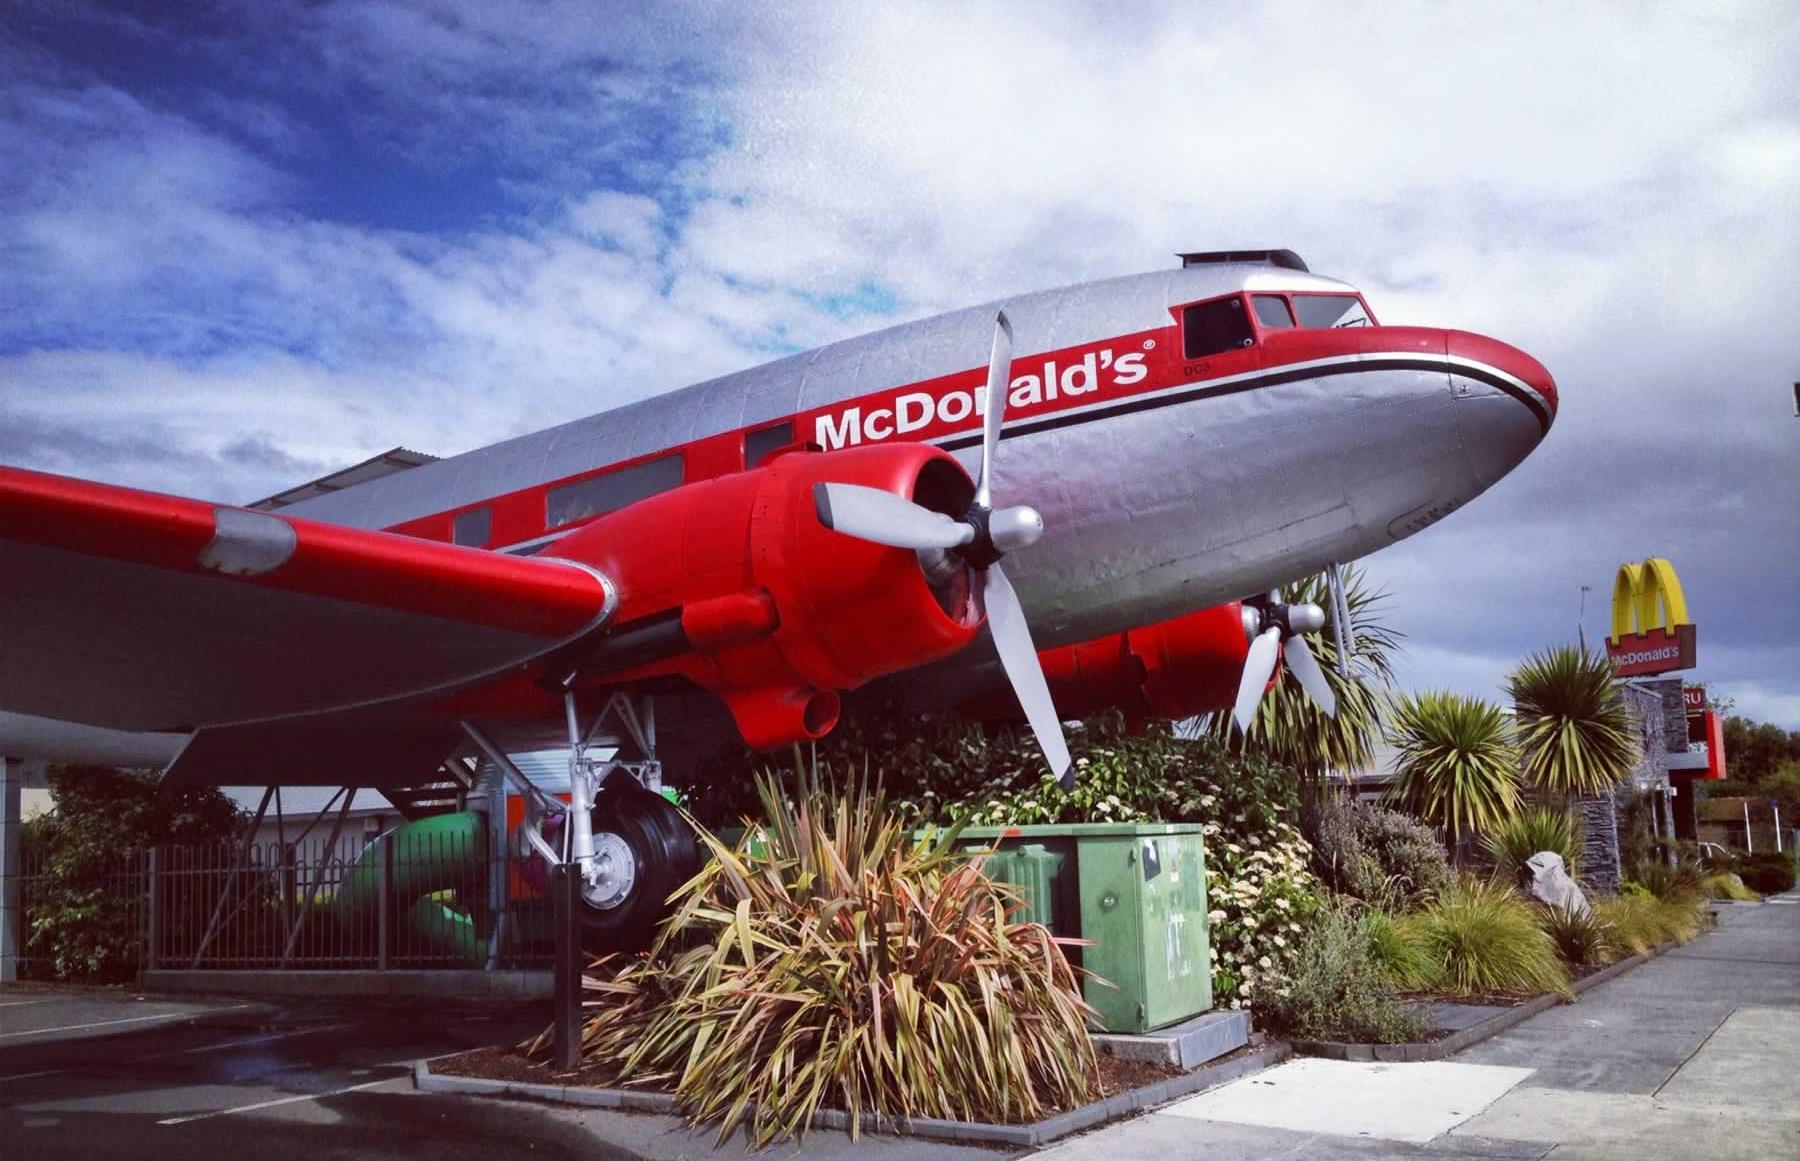 McDonalds Taupo DC Plane.CGRBhw